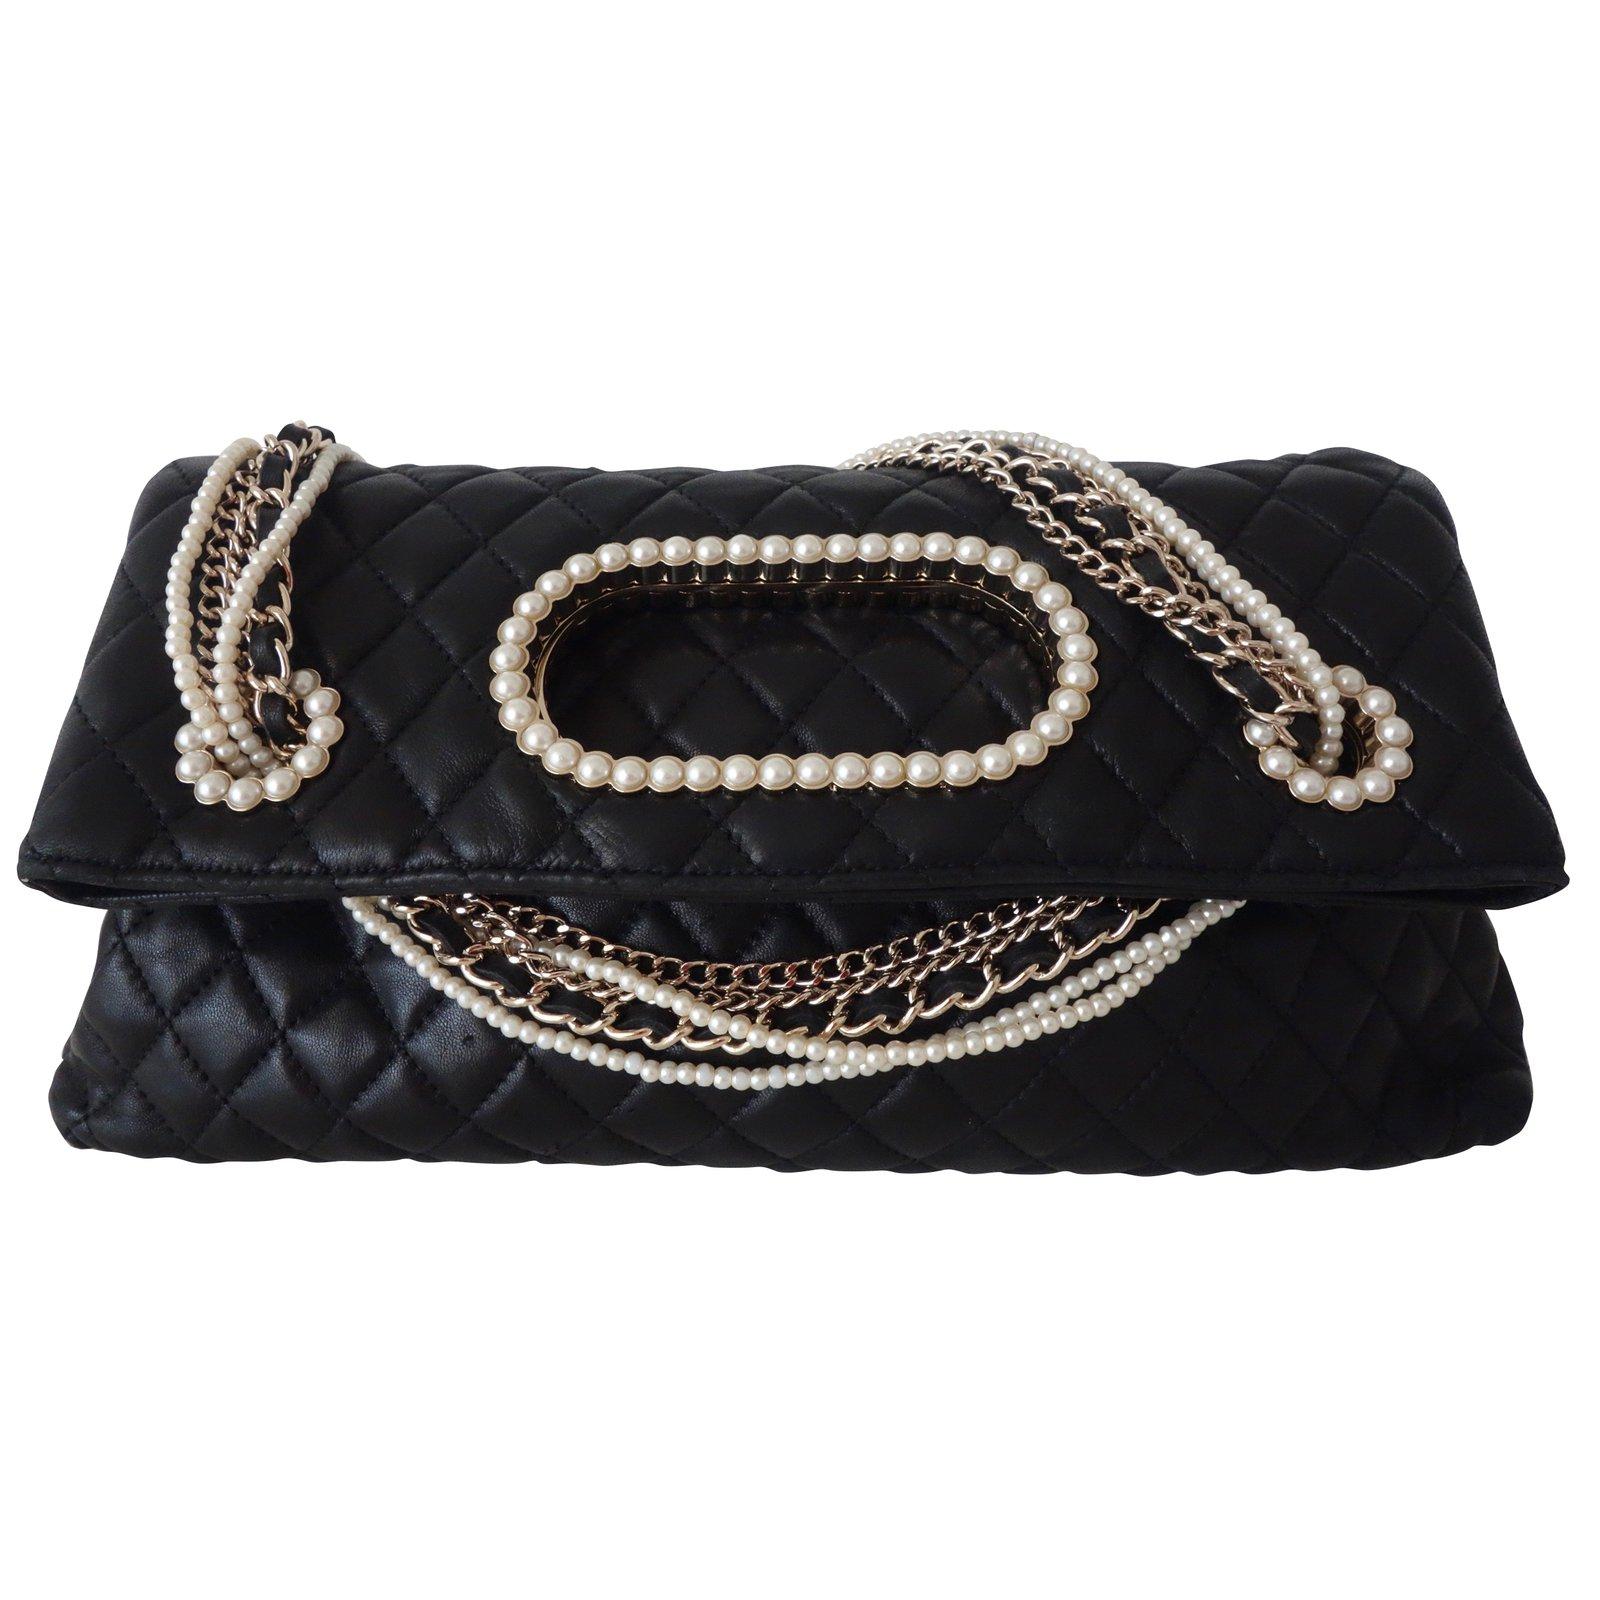 65480a447071 Chanel WESTMINSTER Handbags Handbags Leather Black ref.60229 - Joli Closet